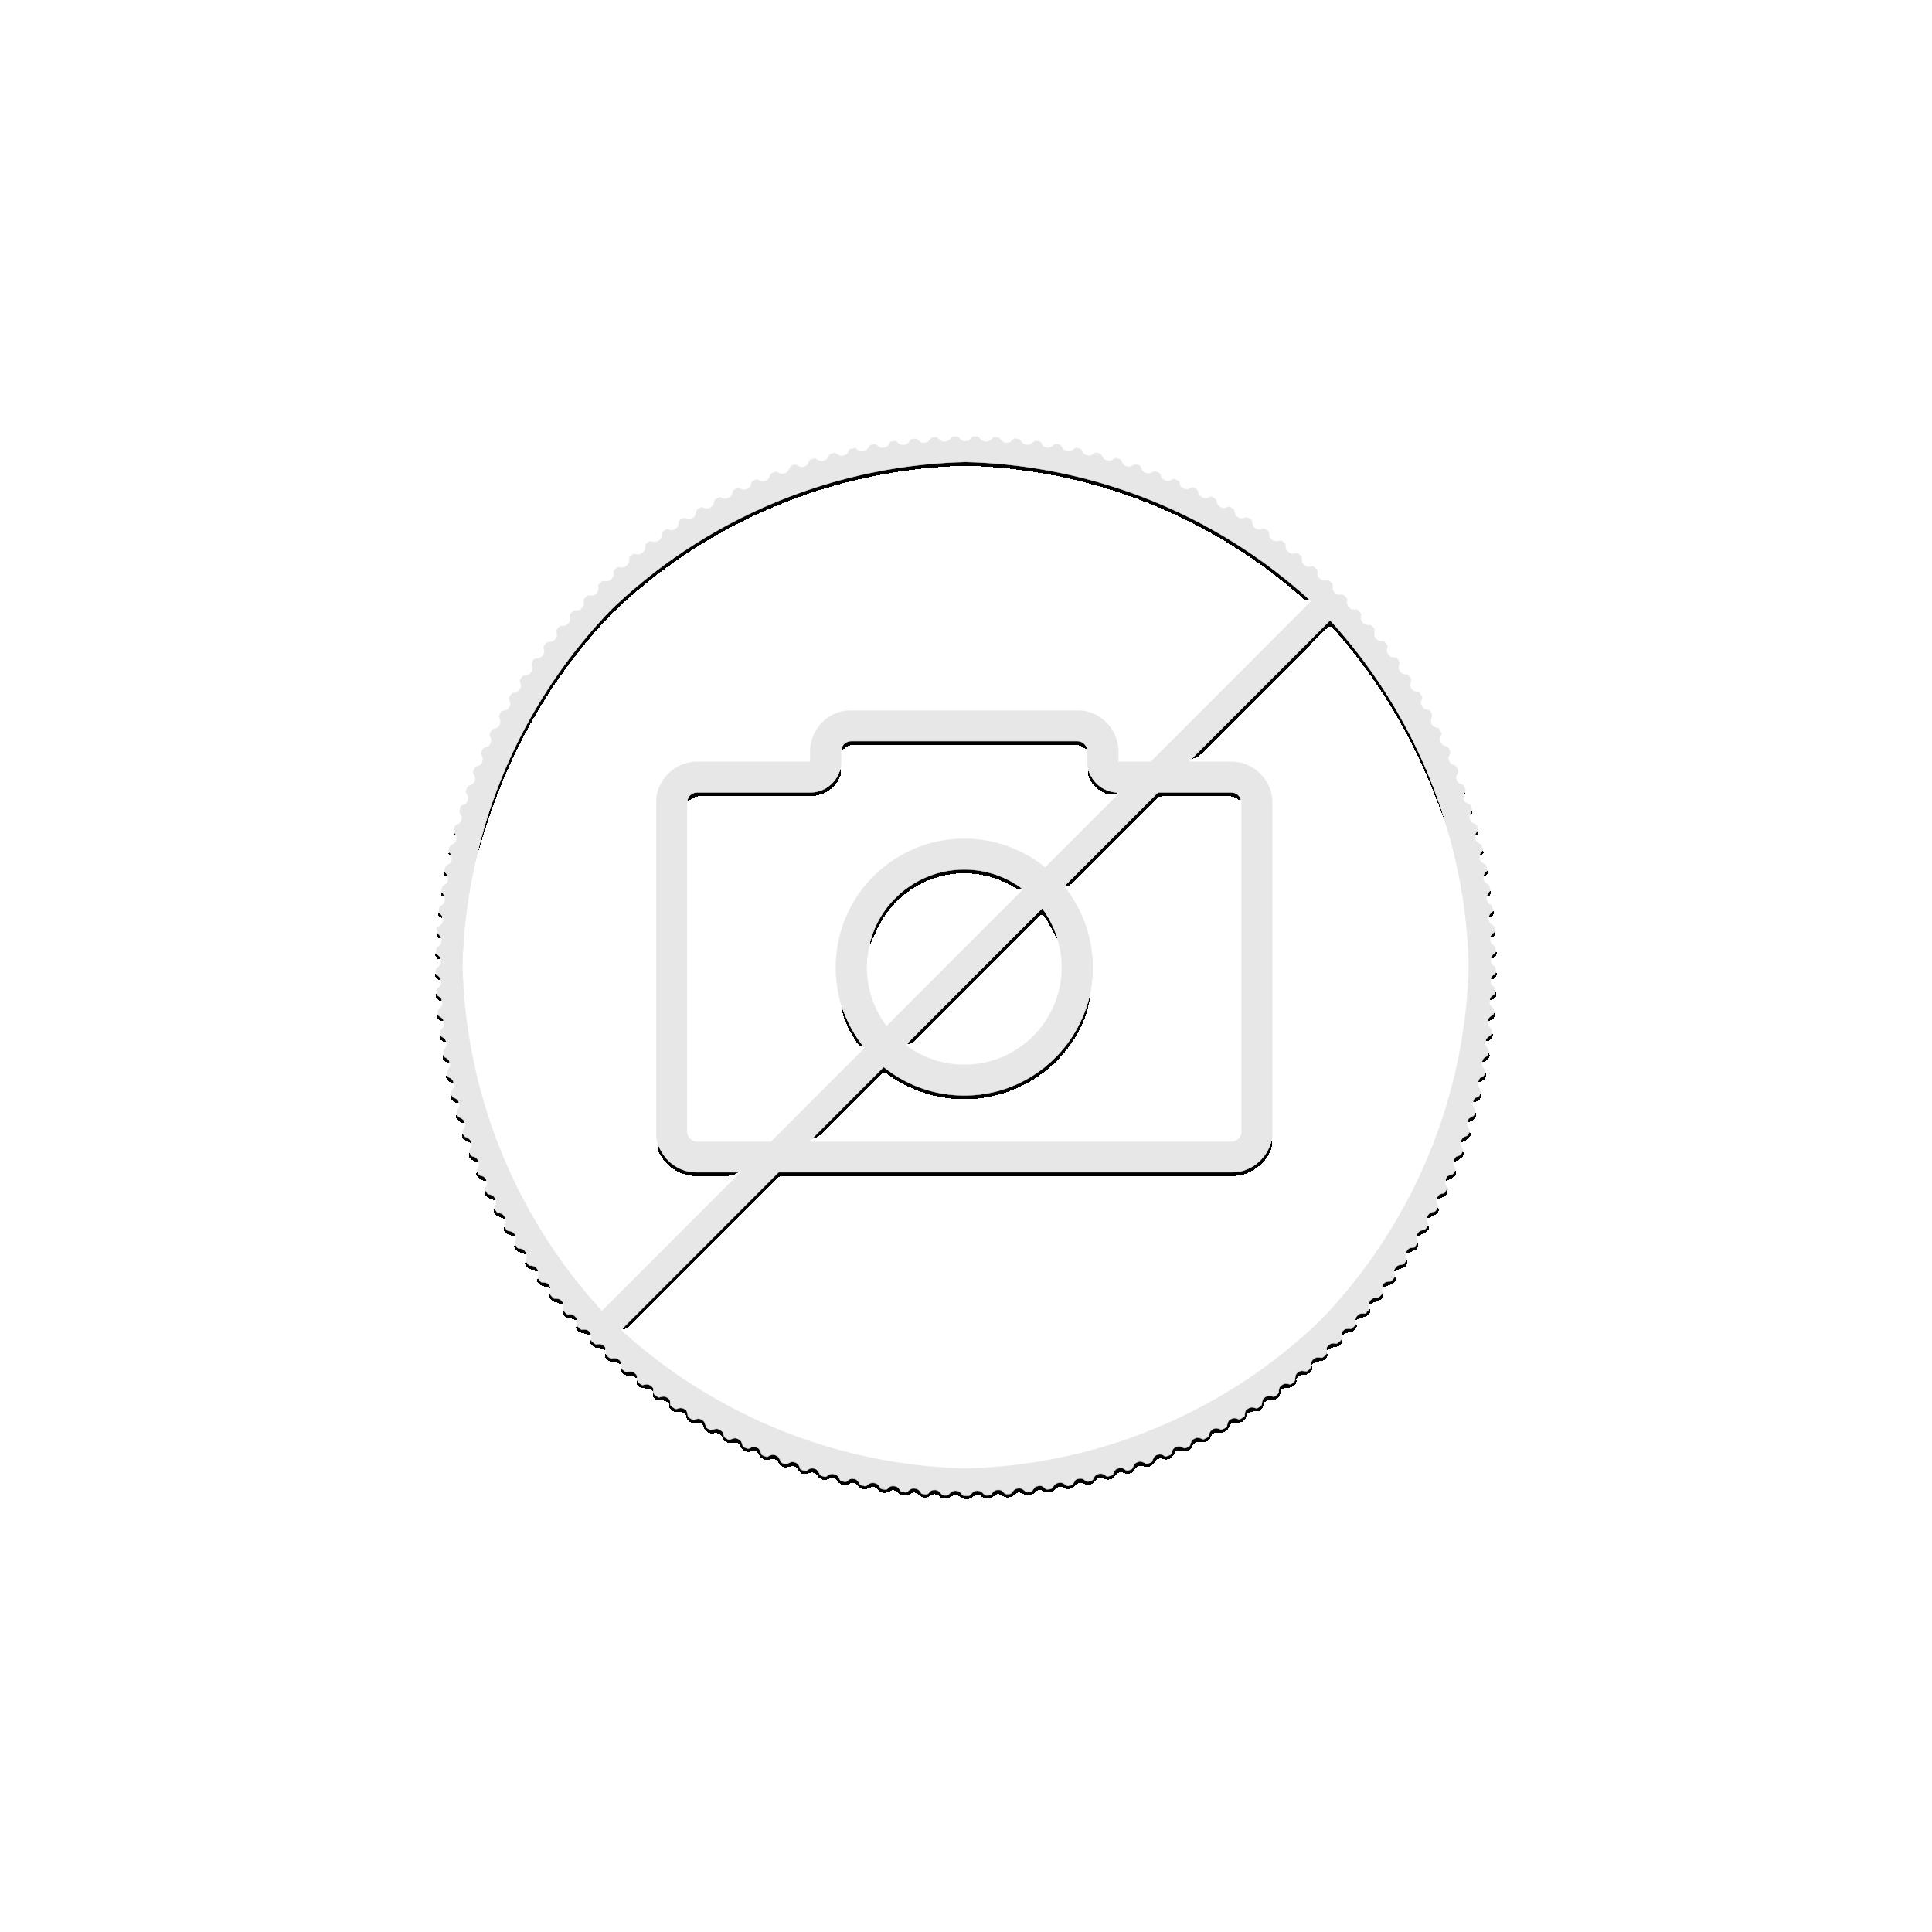 Gouden munt Duitse Mark 2001